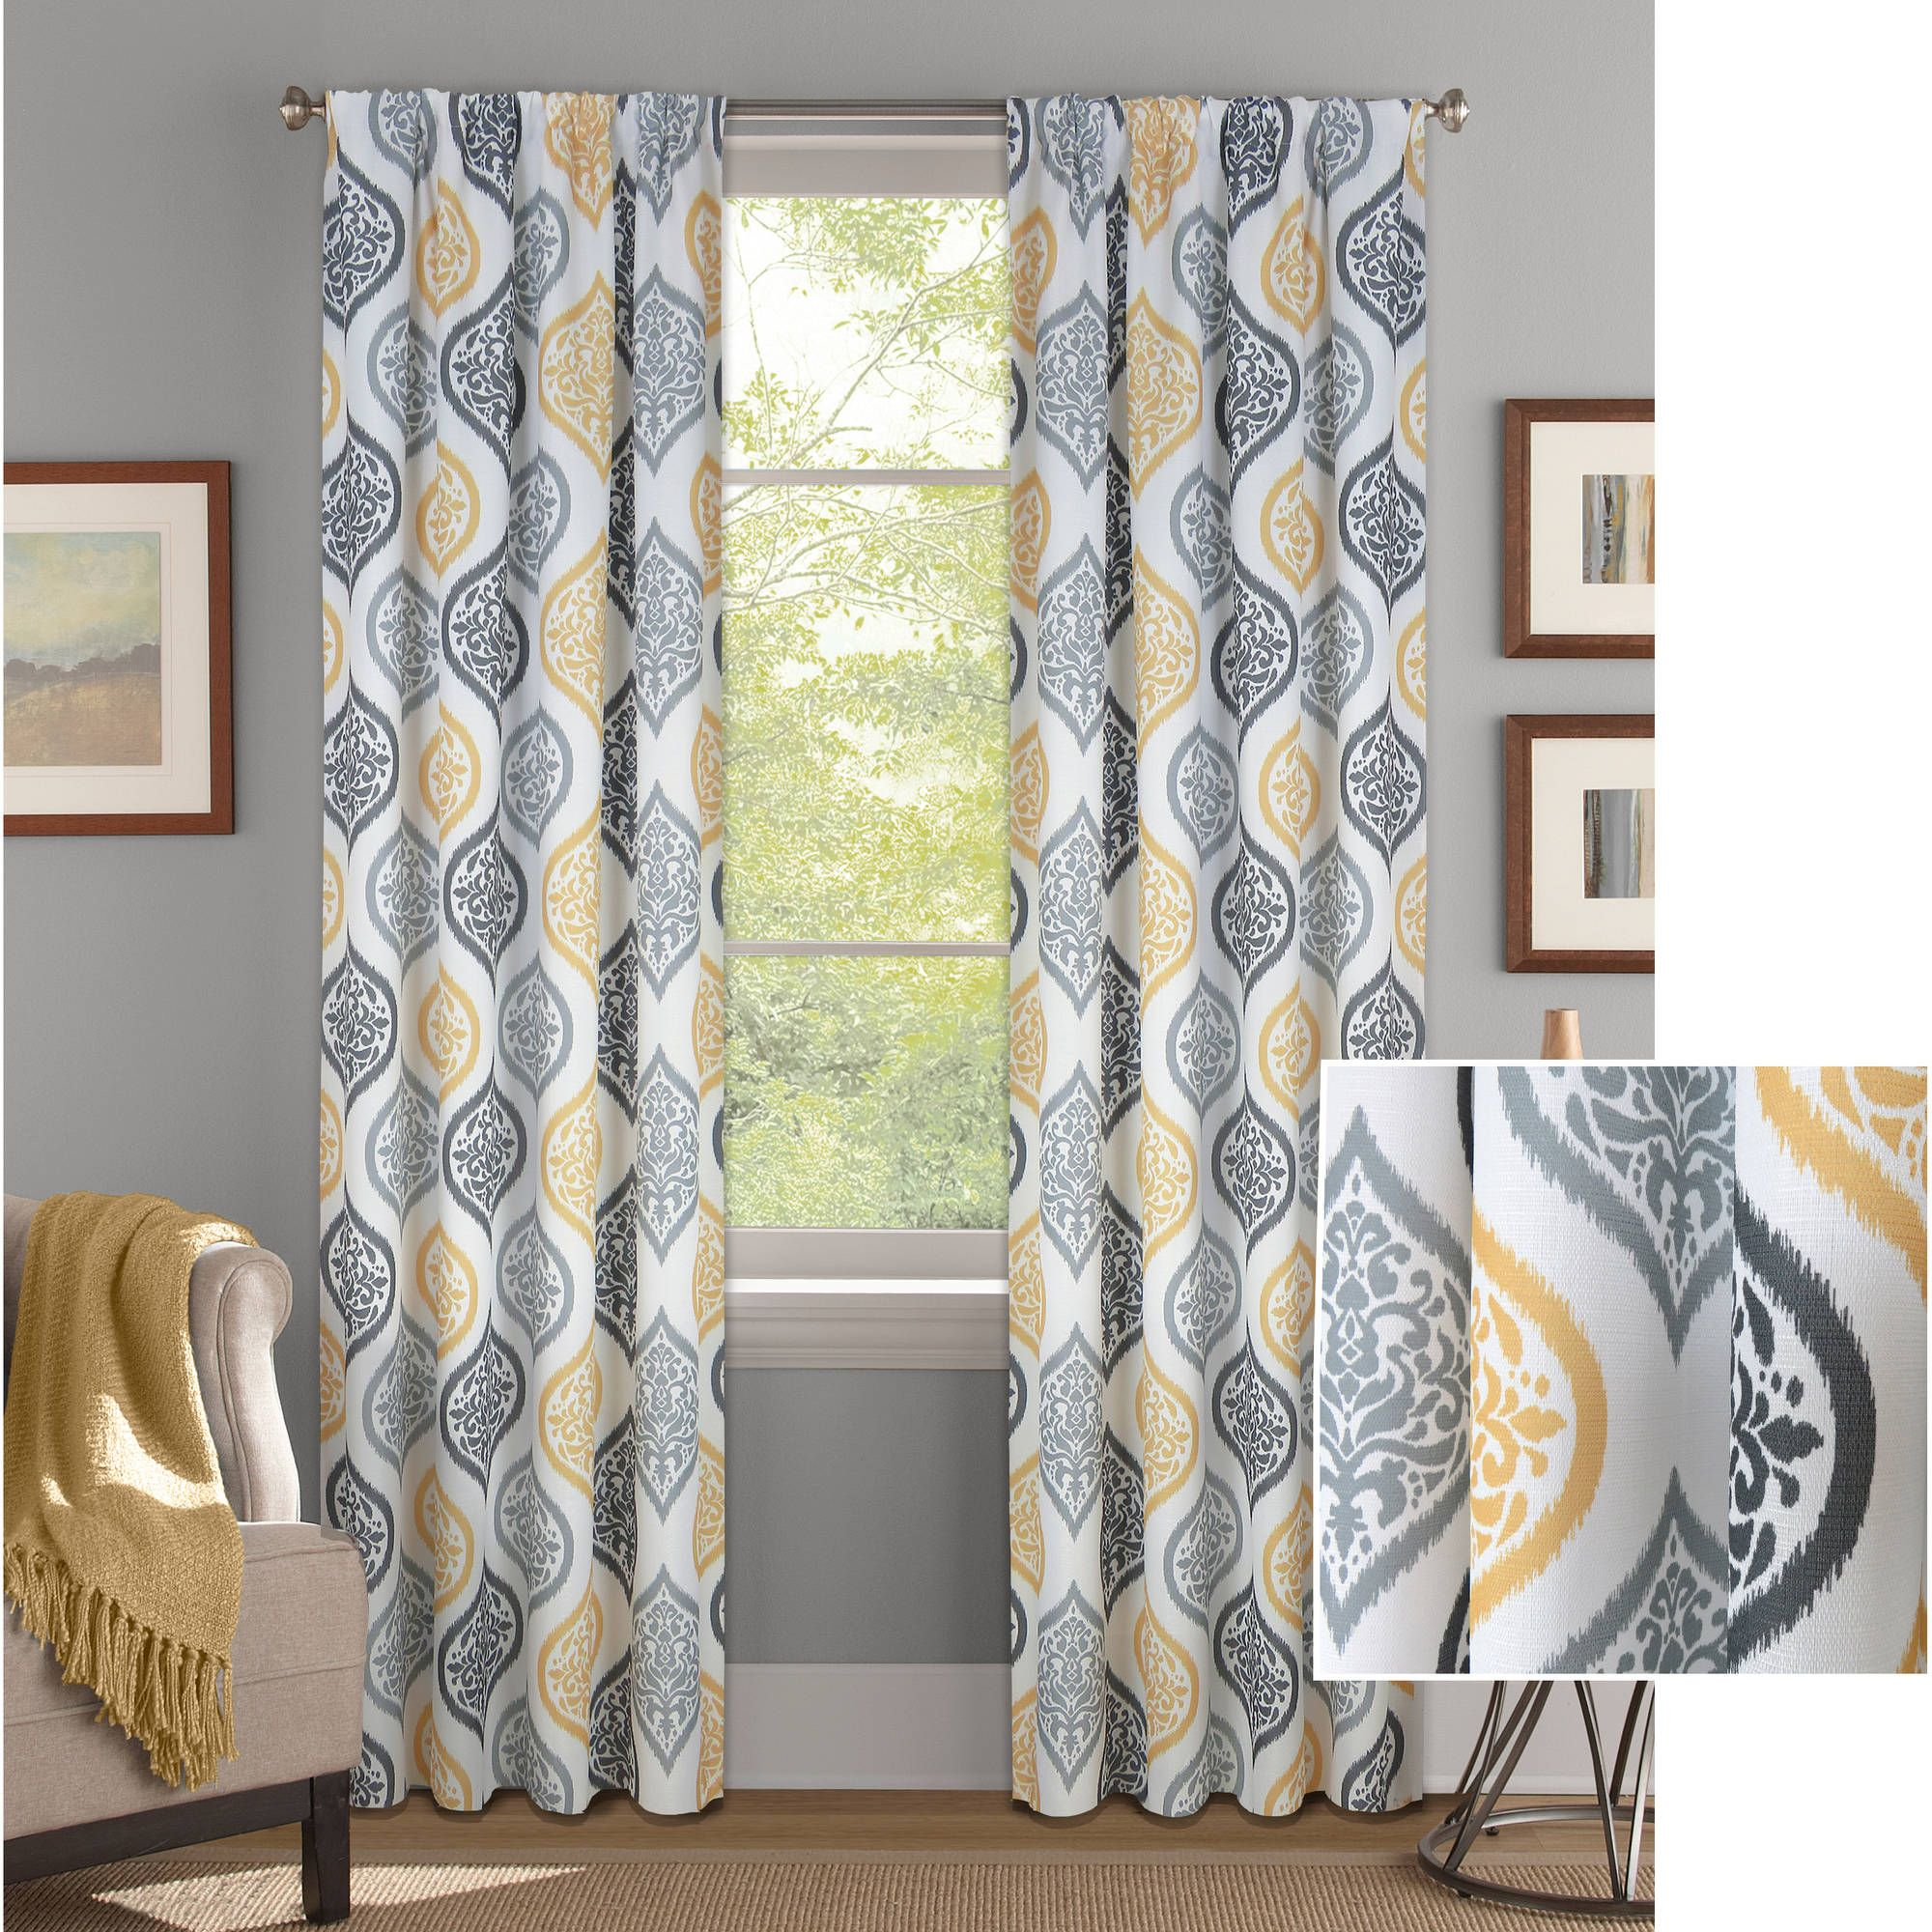 95f46b263ed9393d8aa186f5e9c189a7 - Better Homes & Gardens Heathered Window Curtain Panel